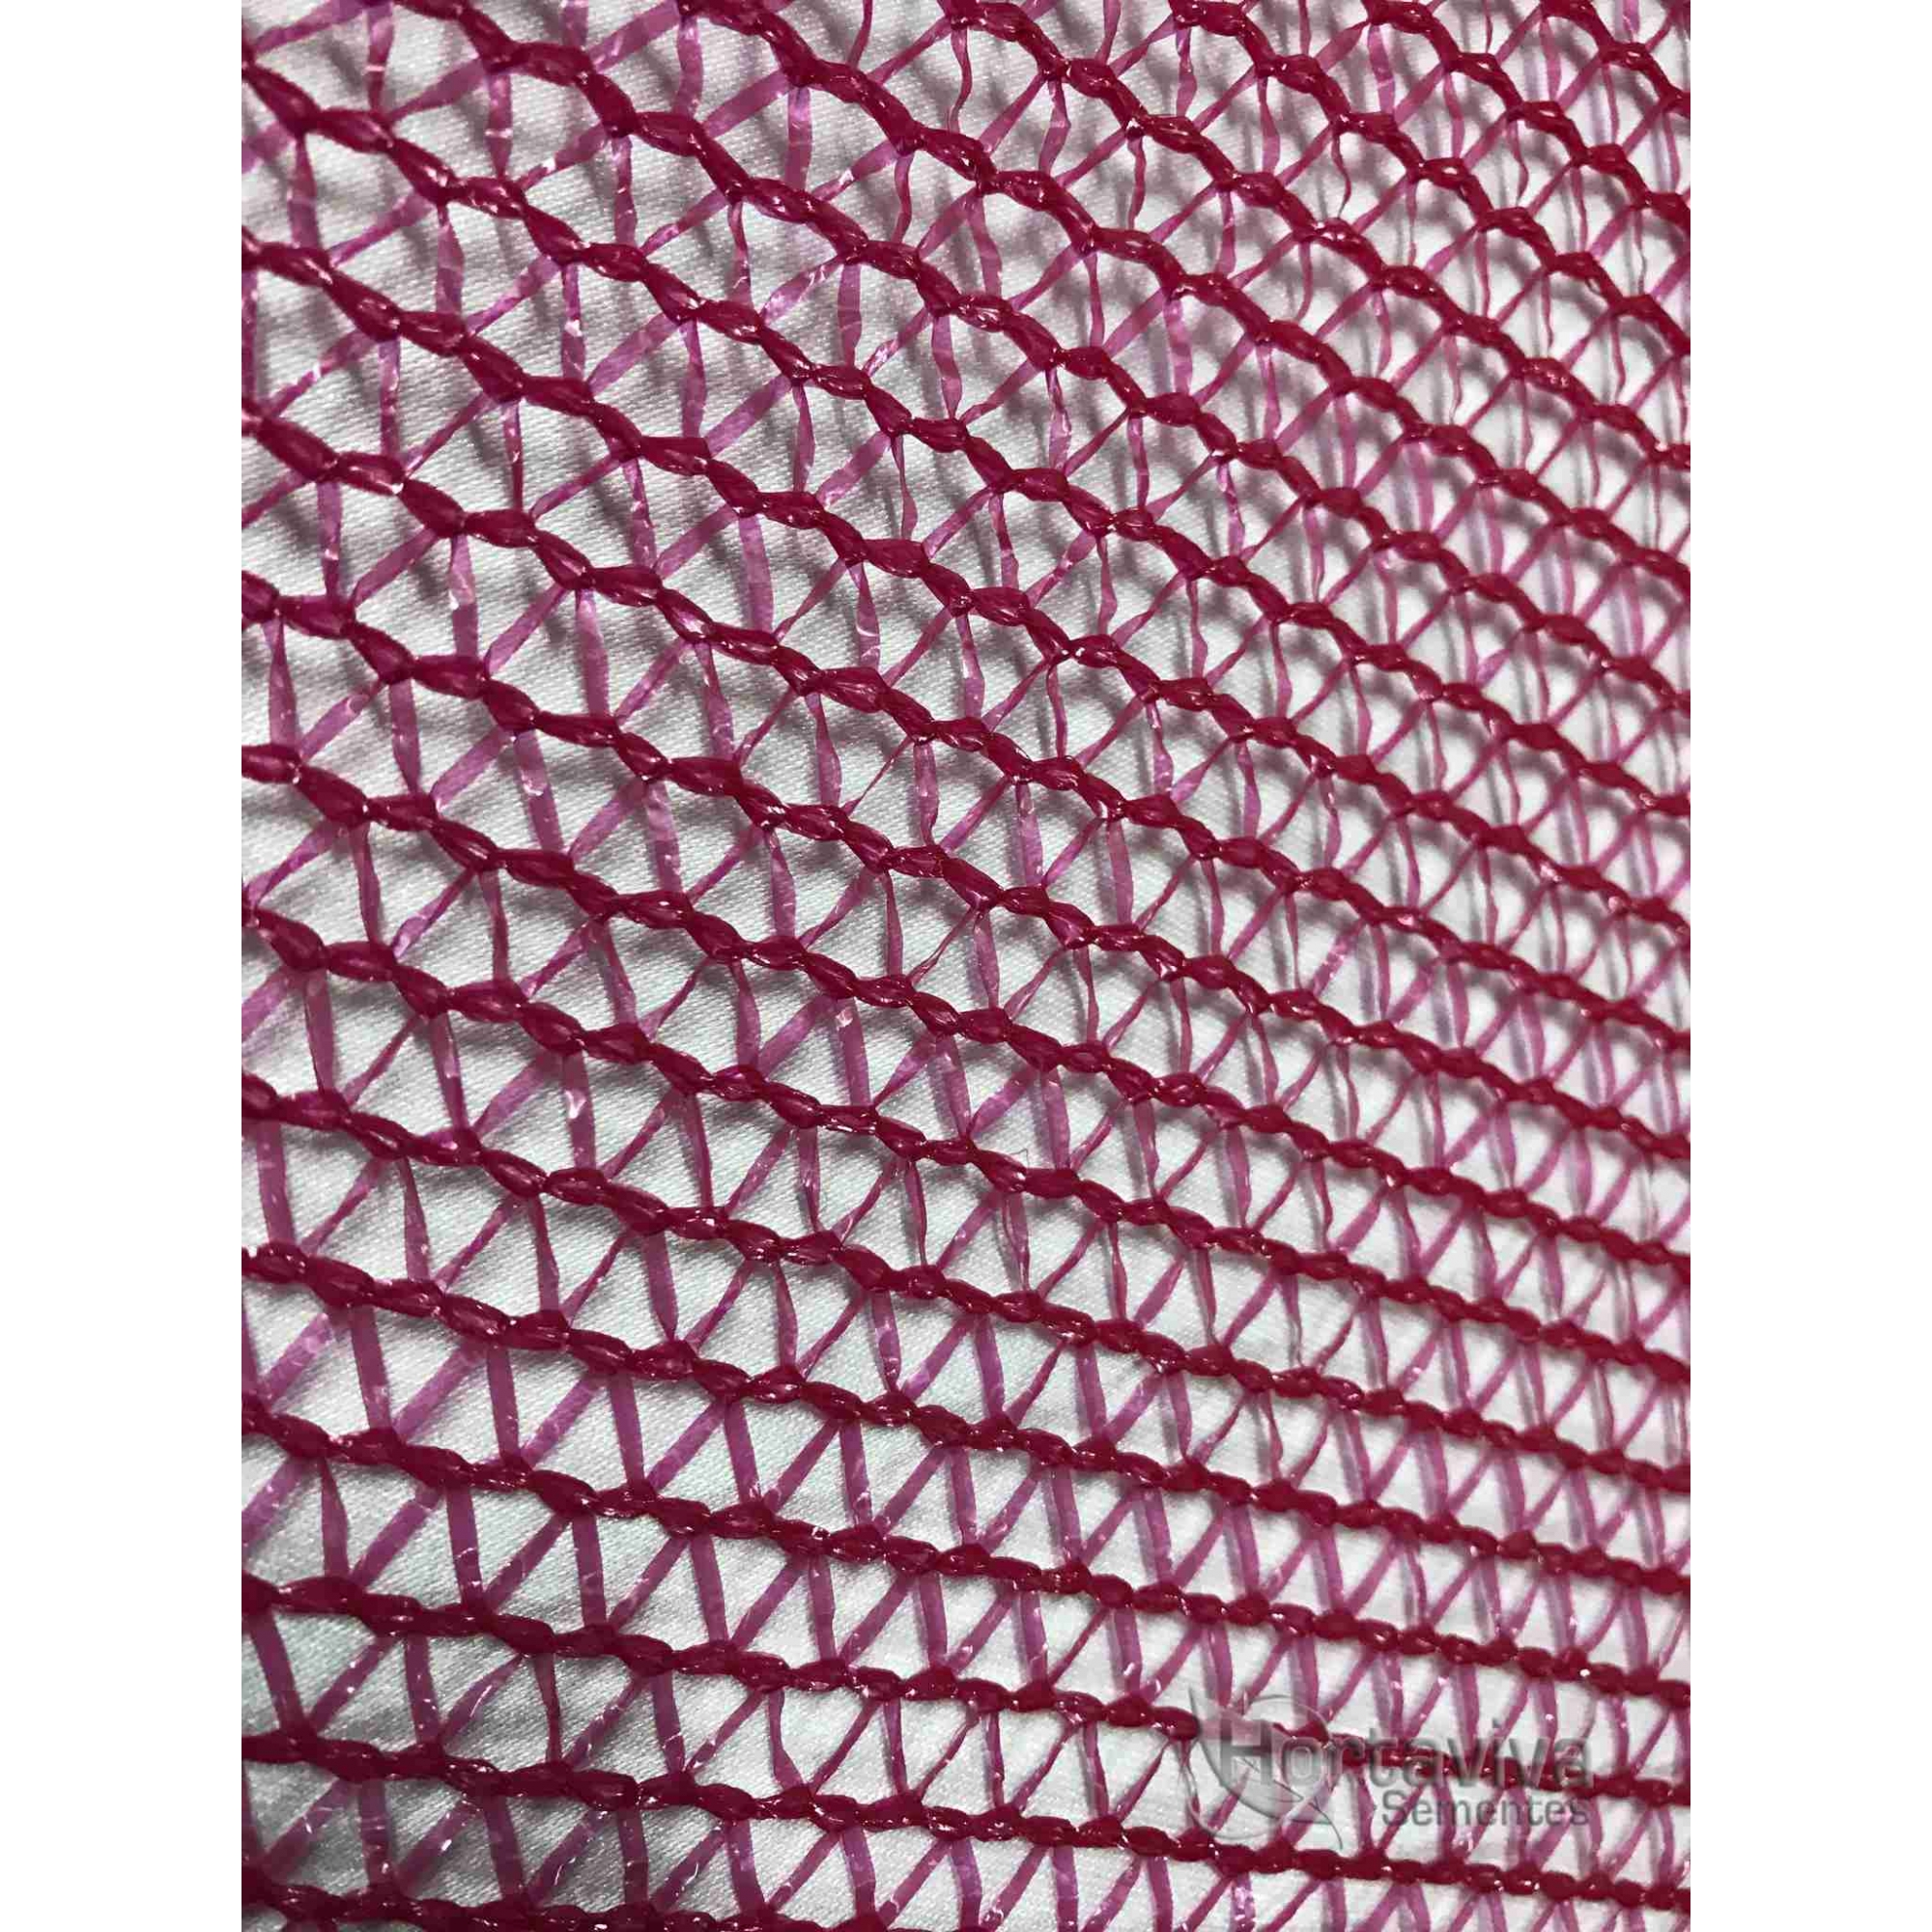 Tela de Sombreamento Vermelha Ultranet - Largura: 10 Metros